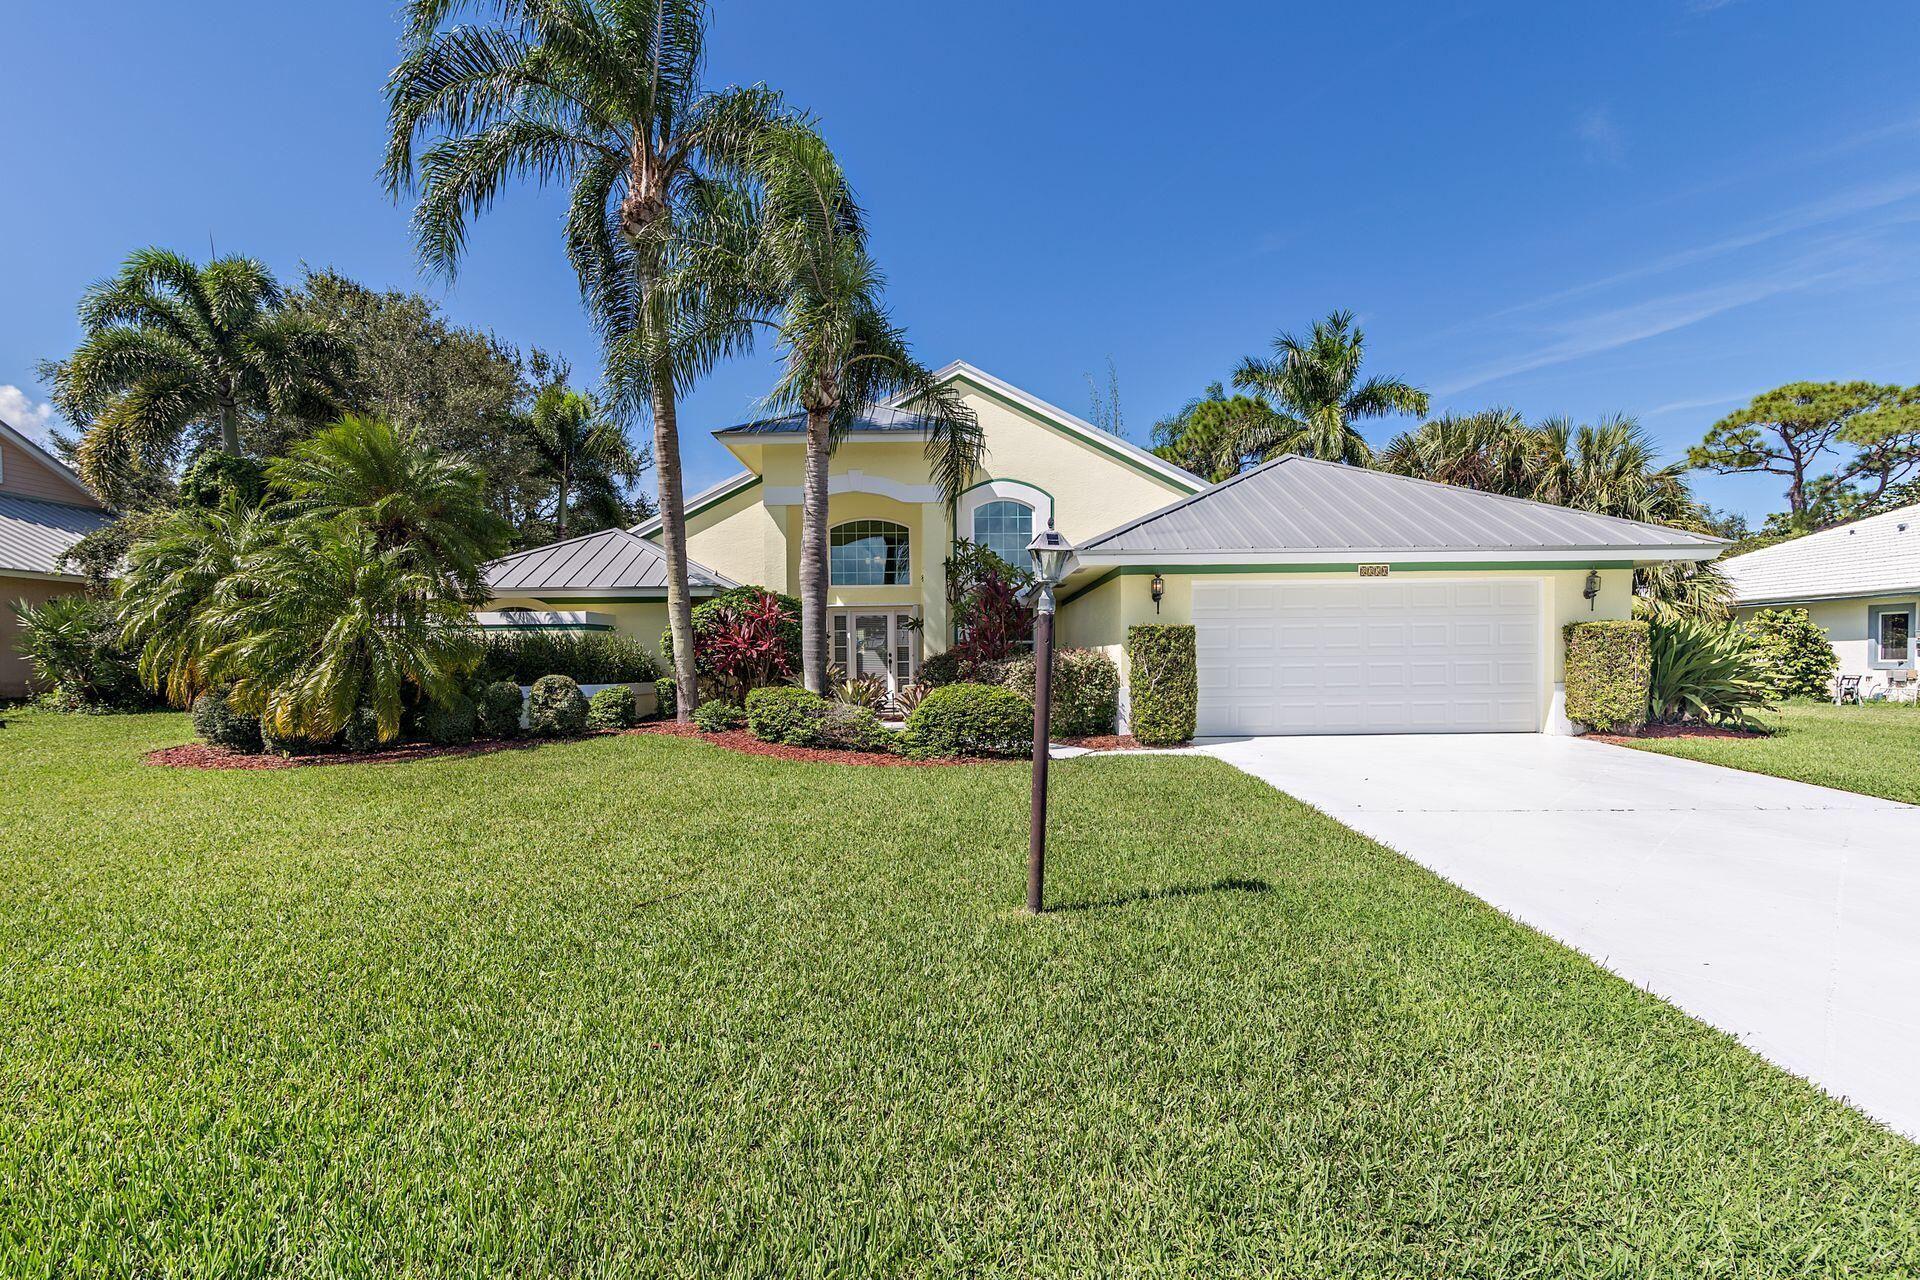 Photo of 8350 SE Woodcrest Place, Hobe Sound, FL 33455 (MLS # RX-10750545)